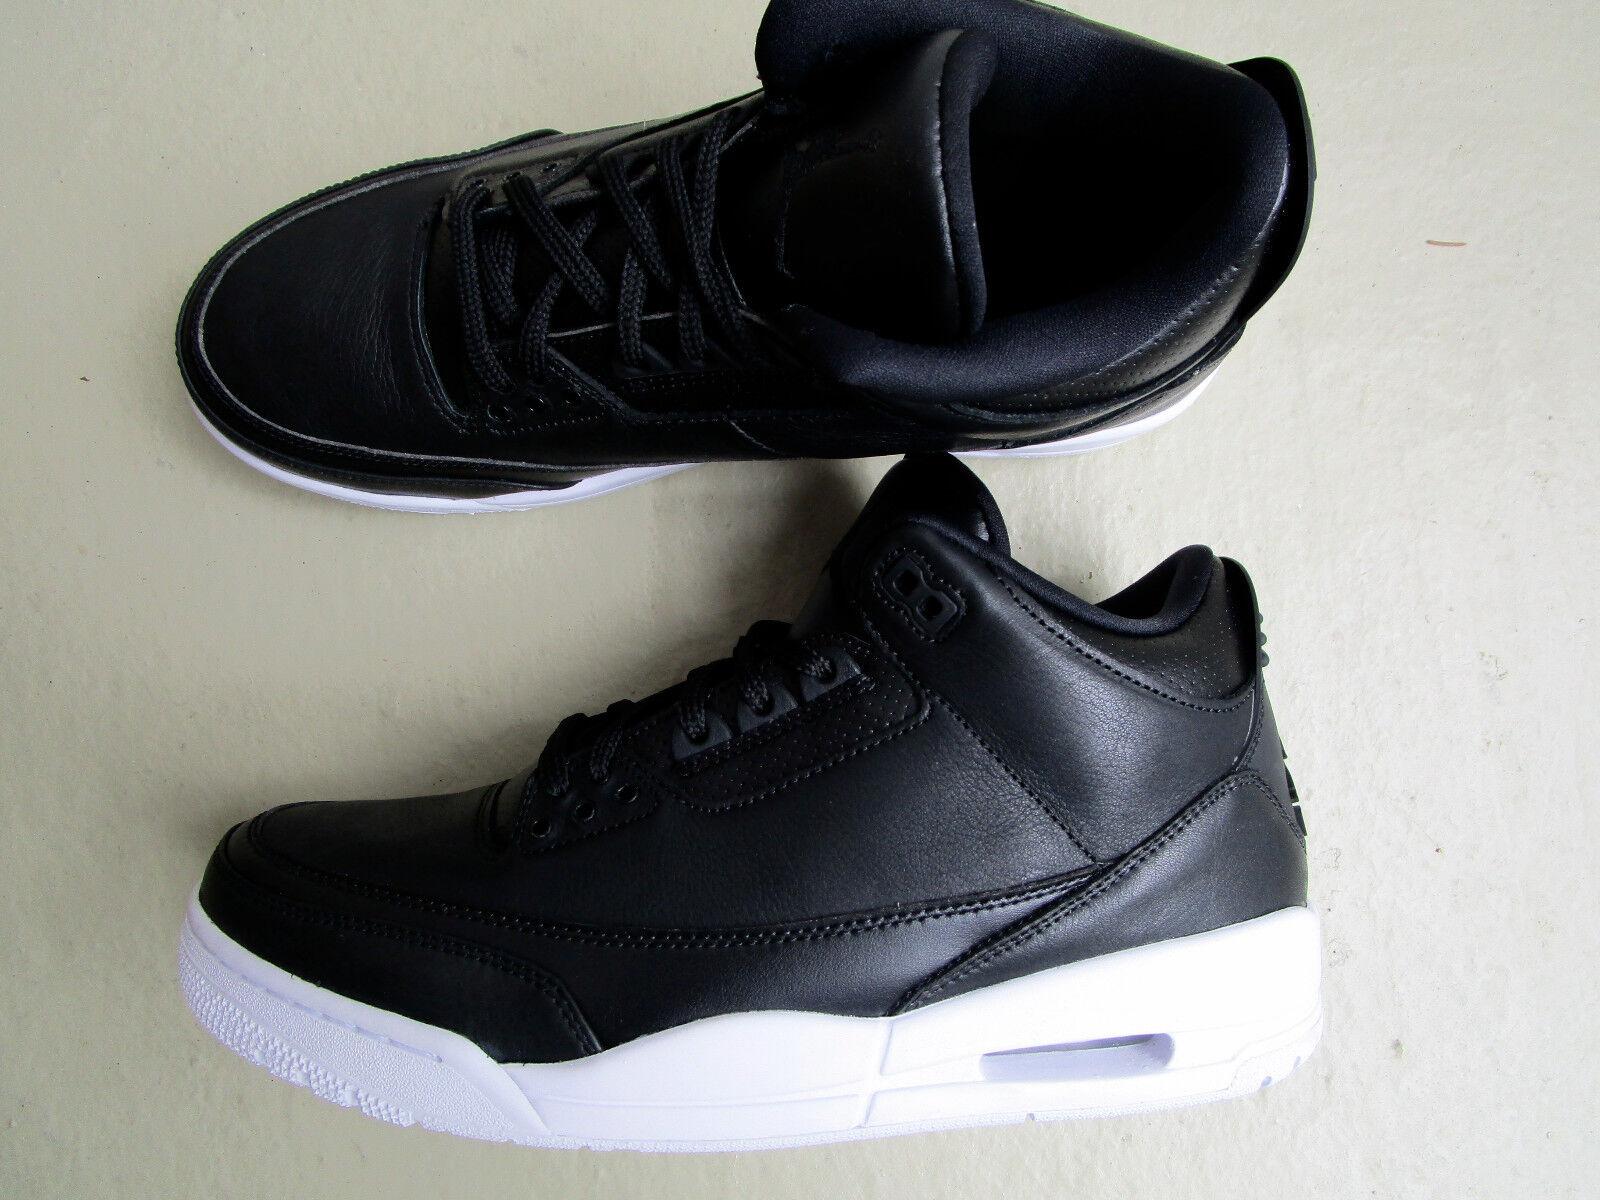 "Nike Air Jordan 3 III Retro 45 2016 ""Cyber Monday  Black Black-White"